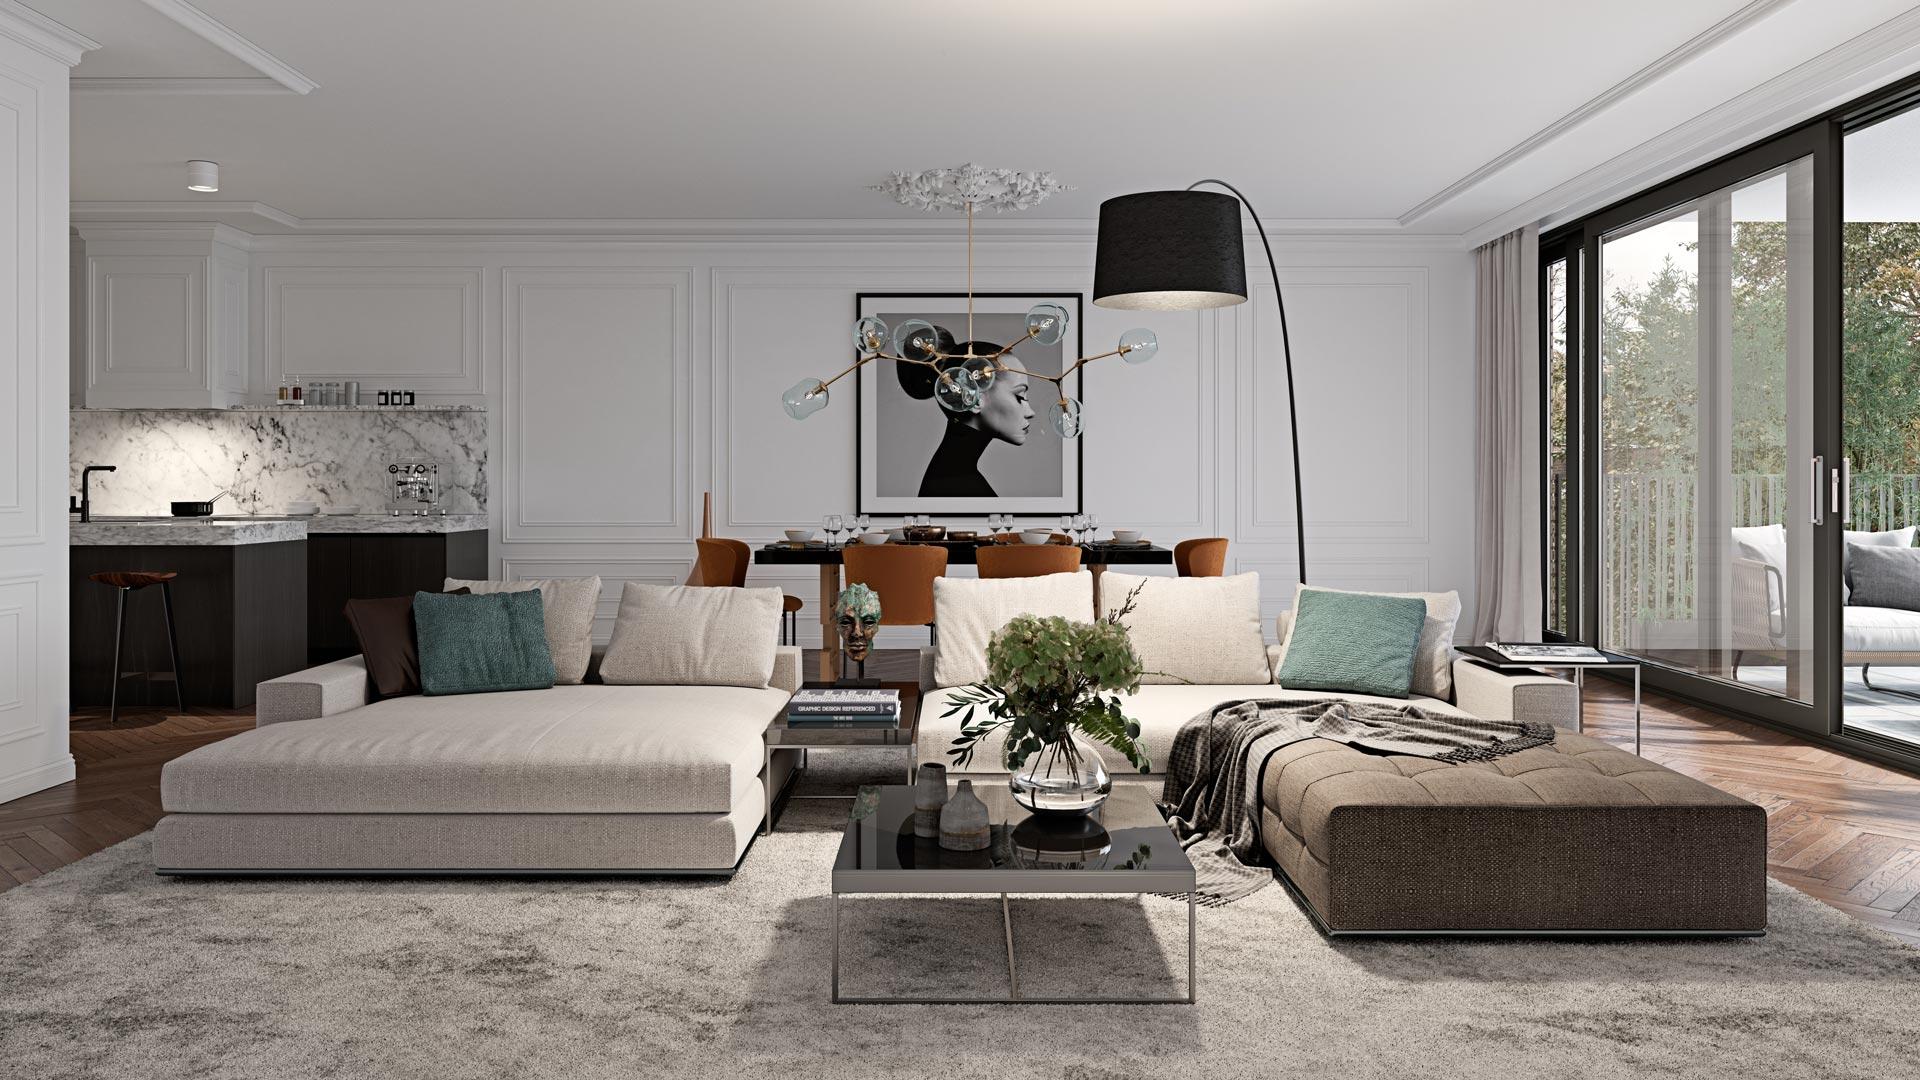 Type D - Interieur Slaapkamer - Appartementen - Elion Park